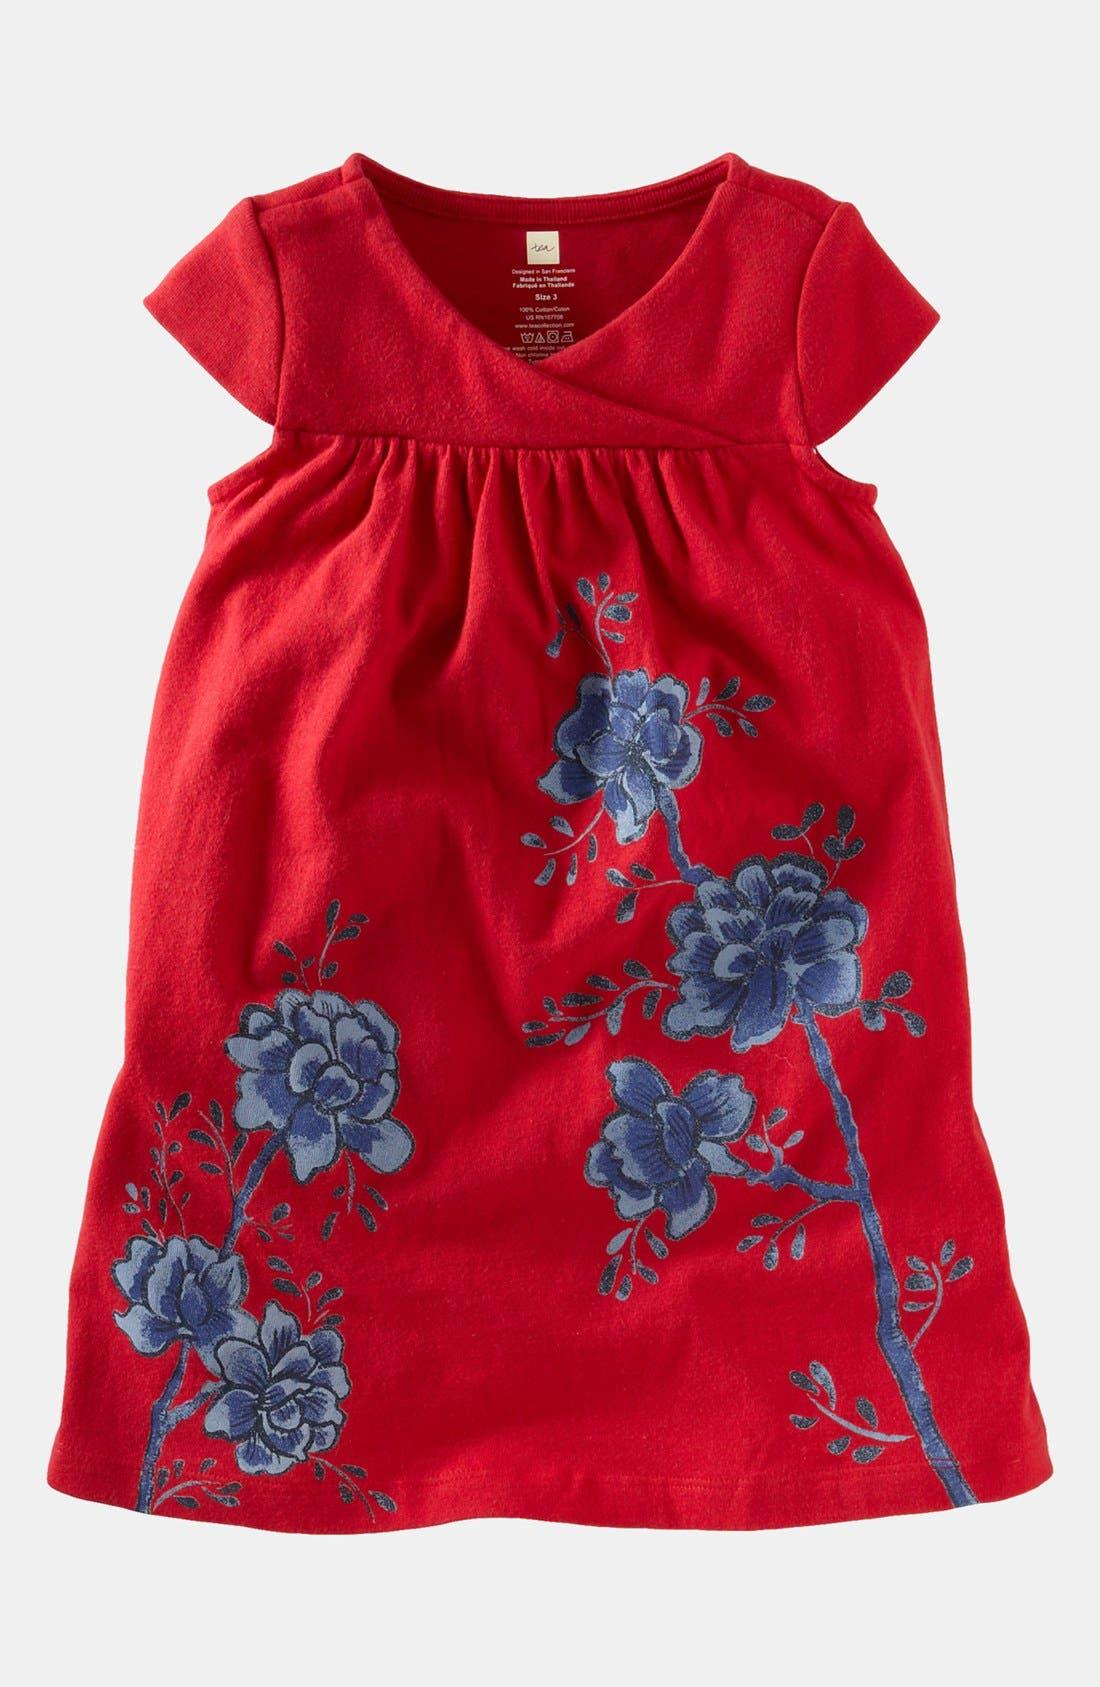 Main Image - Tea Collection 'Painted Pottery' Dress (Toddler Girls, Little Girls & Big Girls)